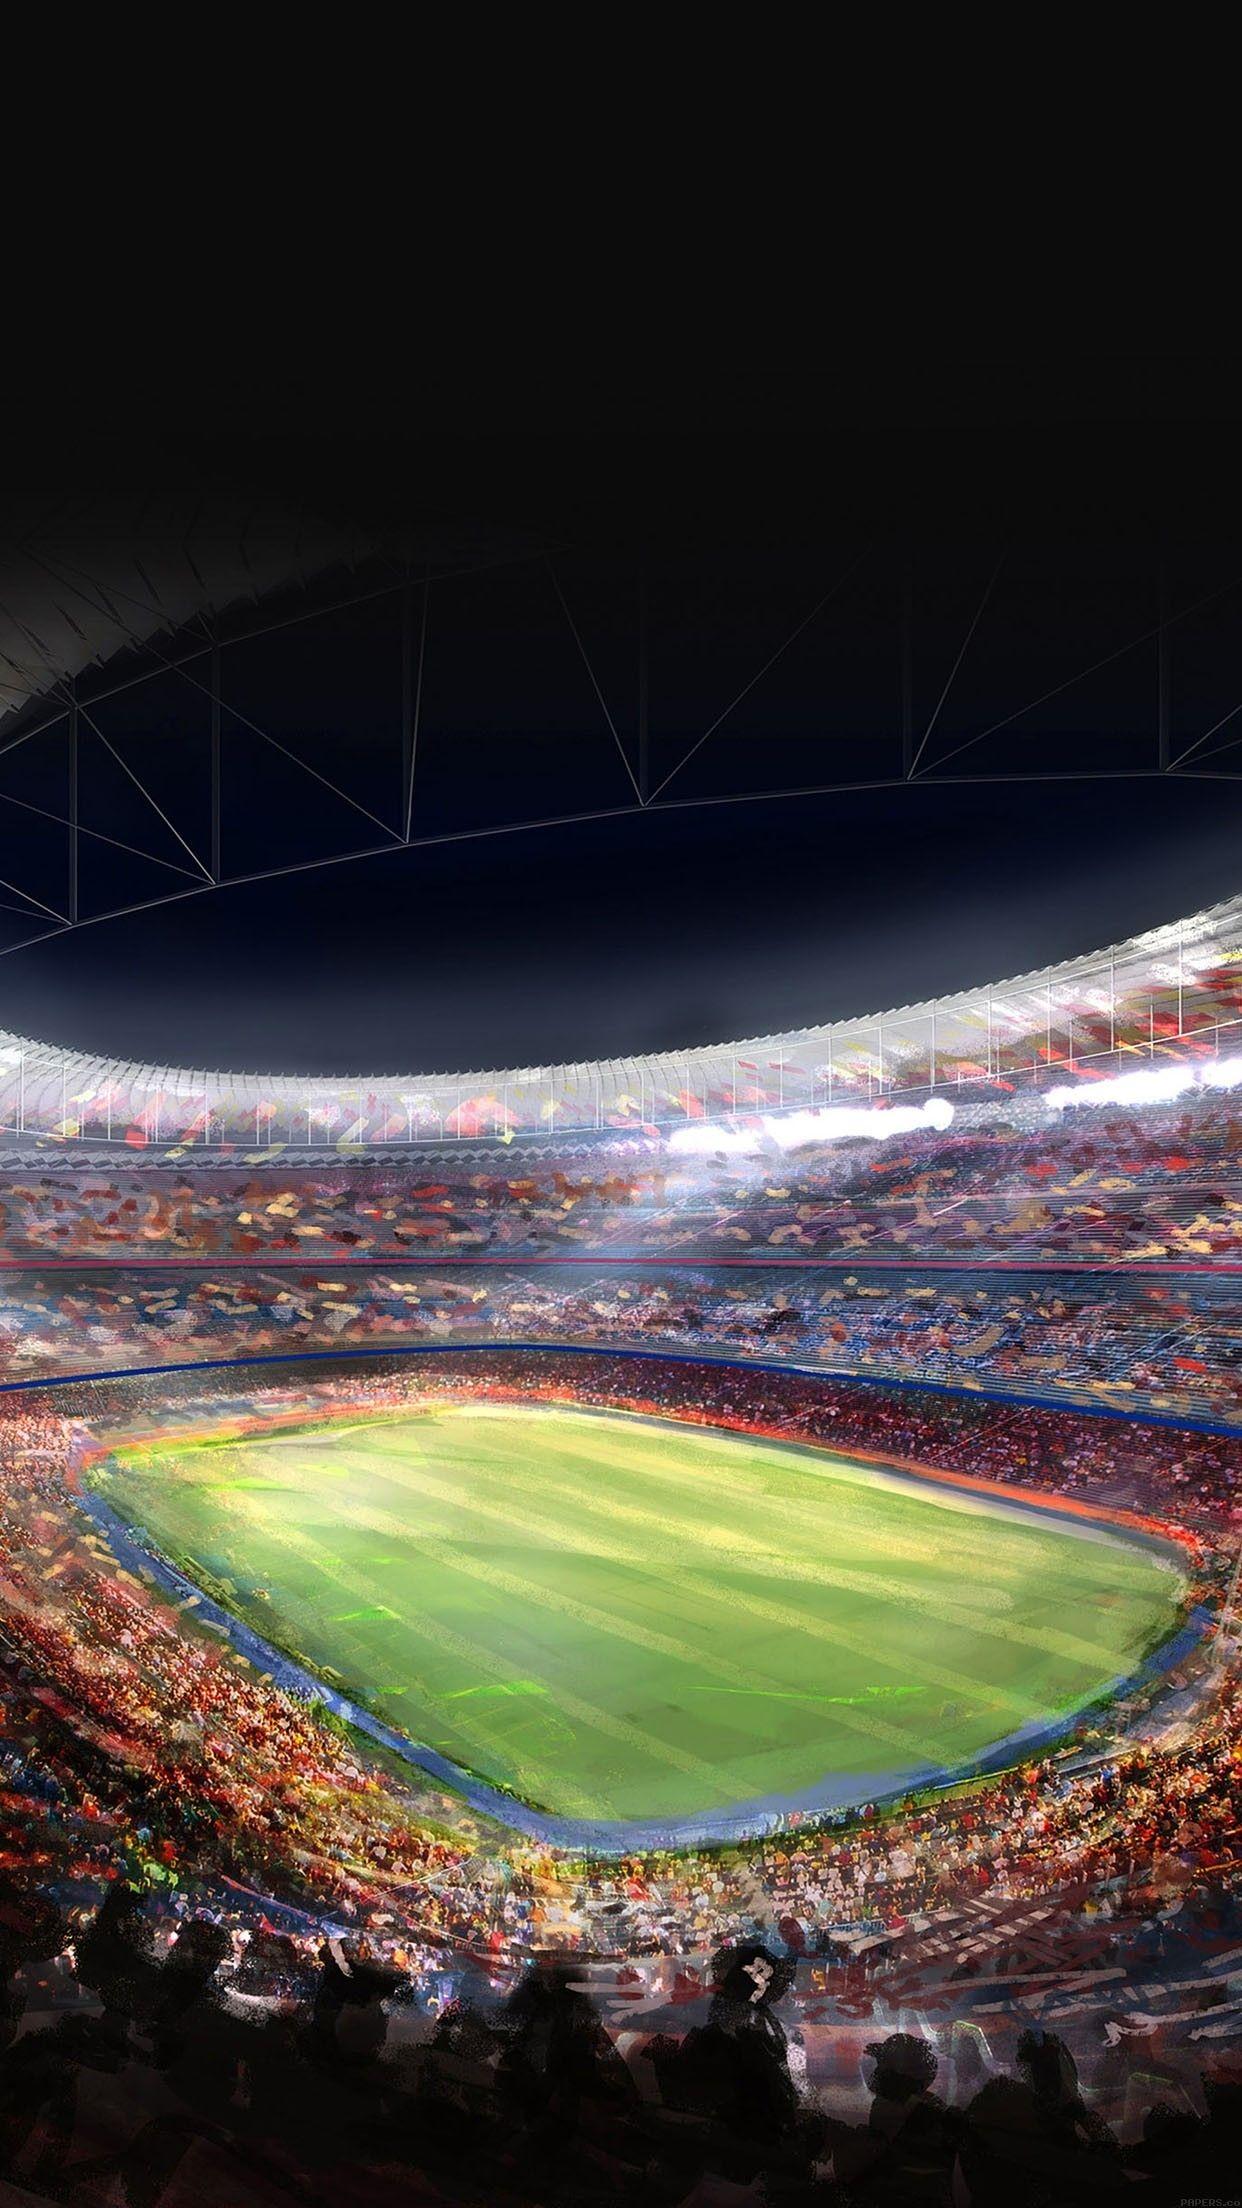 Soccer Field Iphone Wallpaper Download New Soccer Field